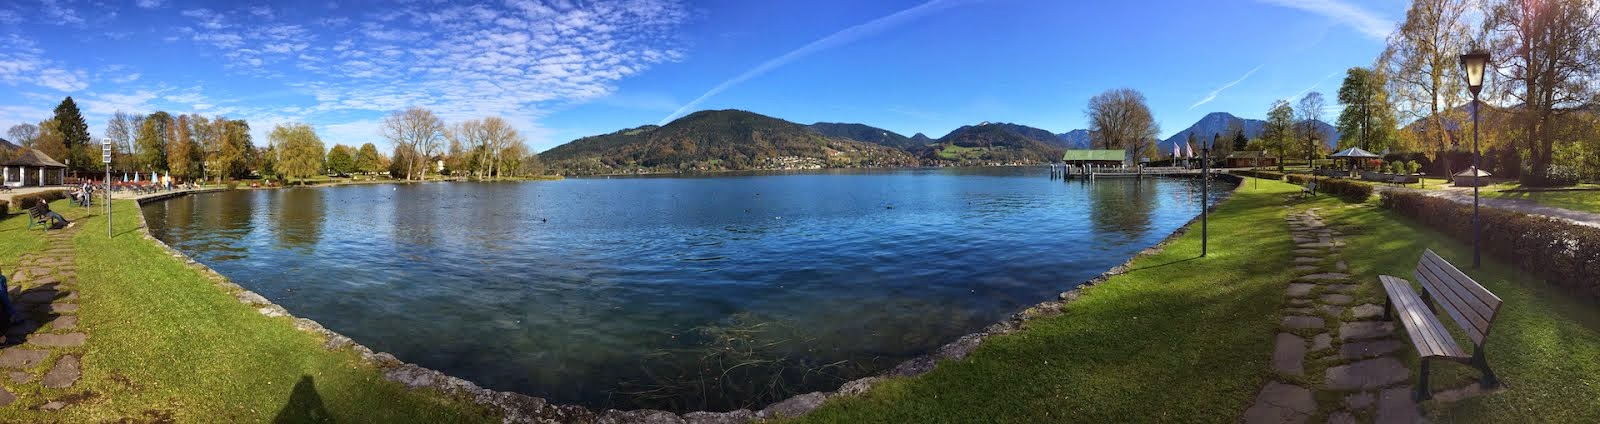 Tegernsee - Bad Wiessee